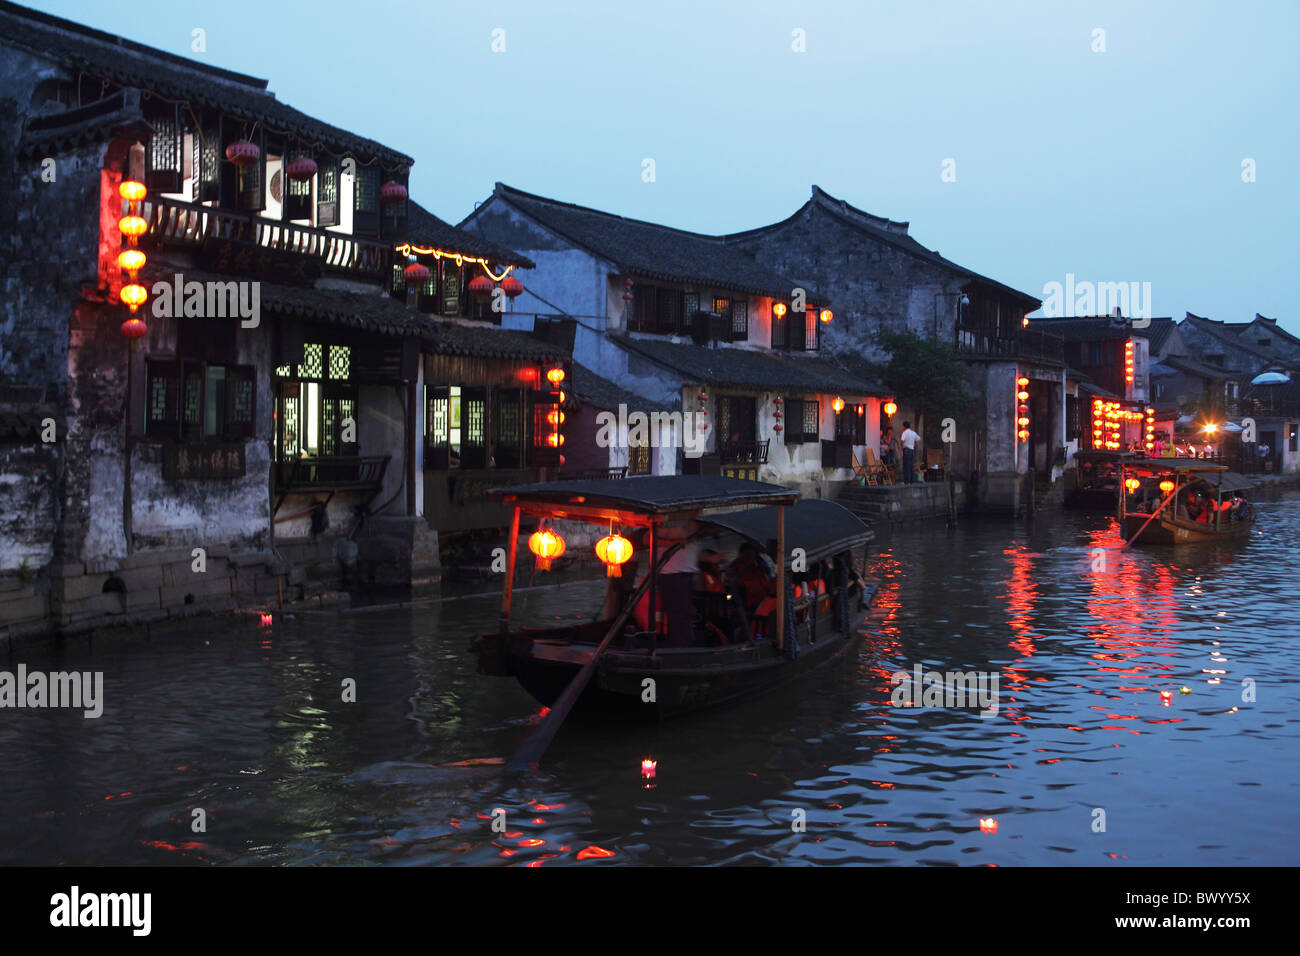 Traditional two story houses along the river at dusk, Xitang, Jiaxing, Zhejiang Province, China - Stock Image